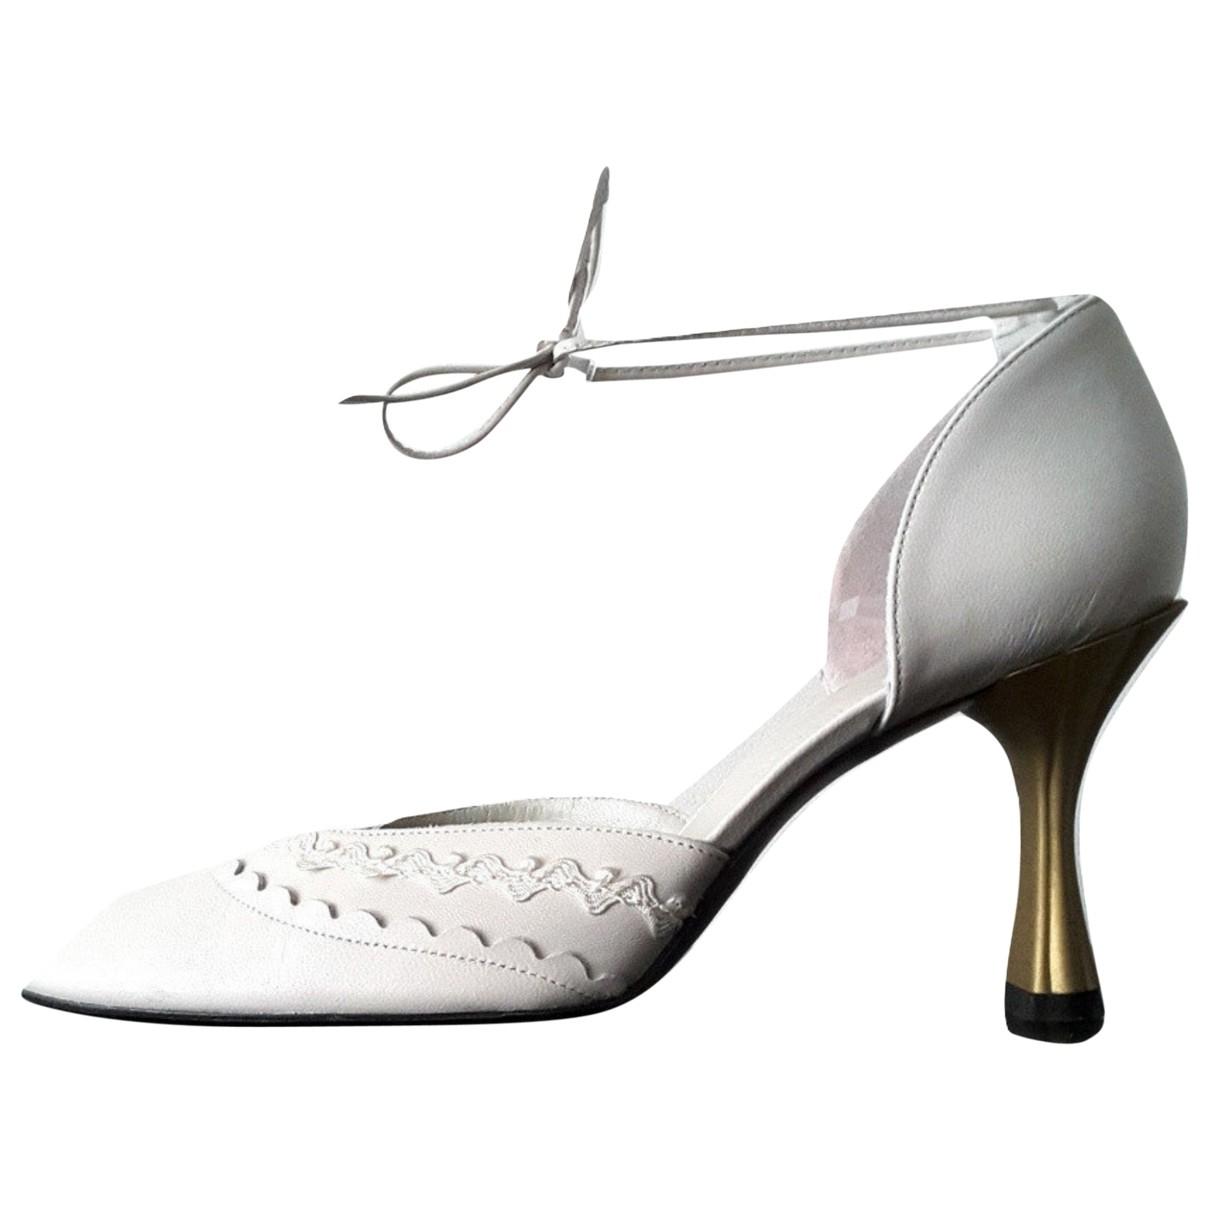 Charles Jourdan - Escarpins   pour femme en cuir - blanc